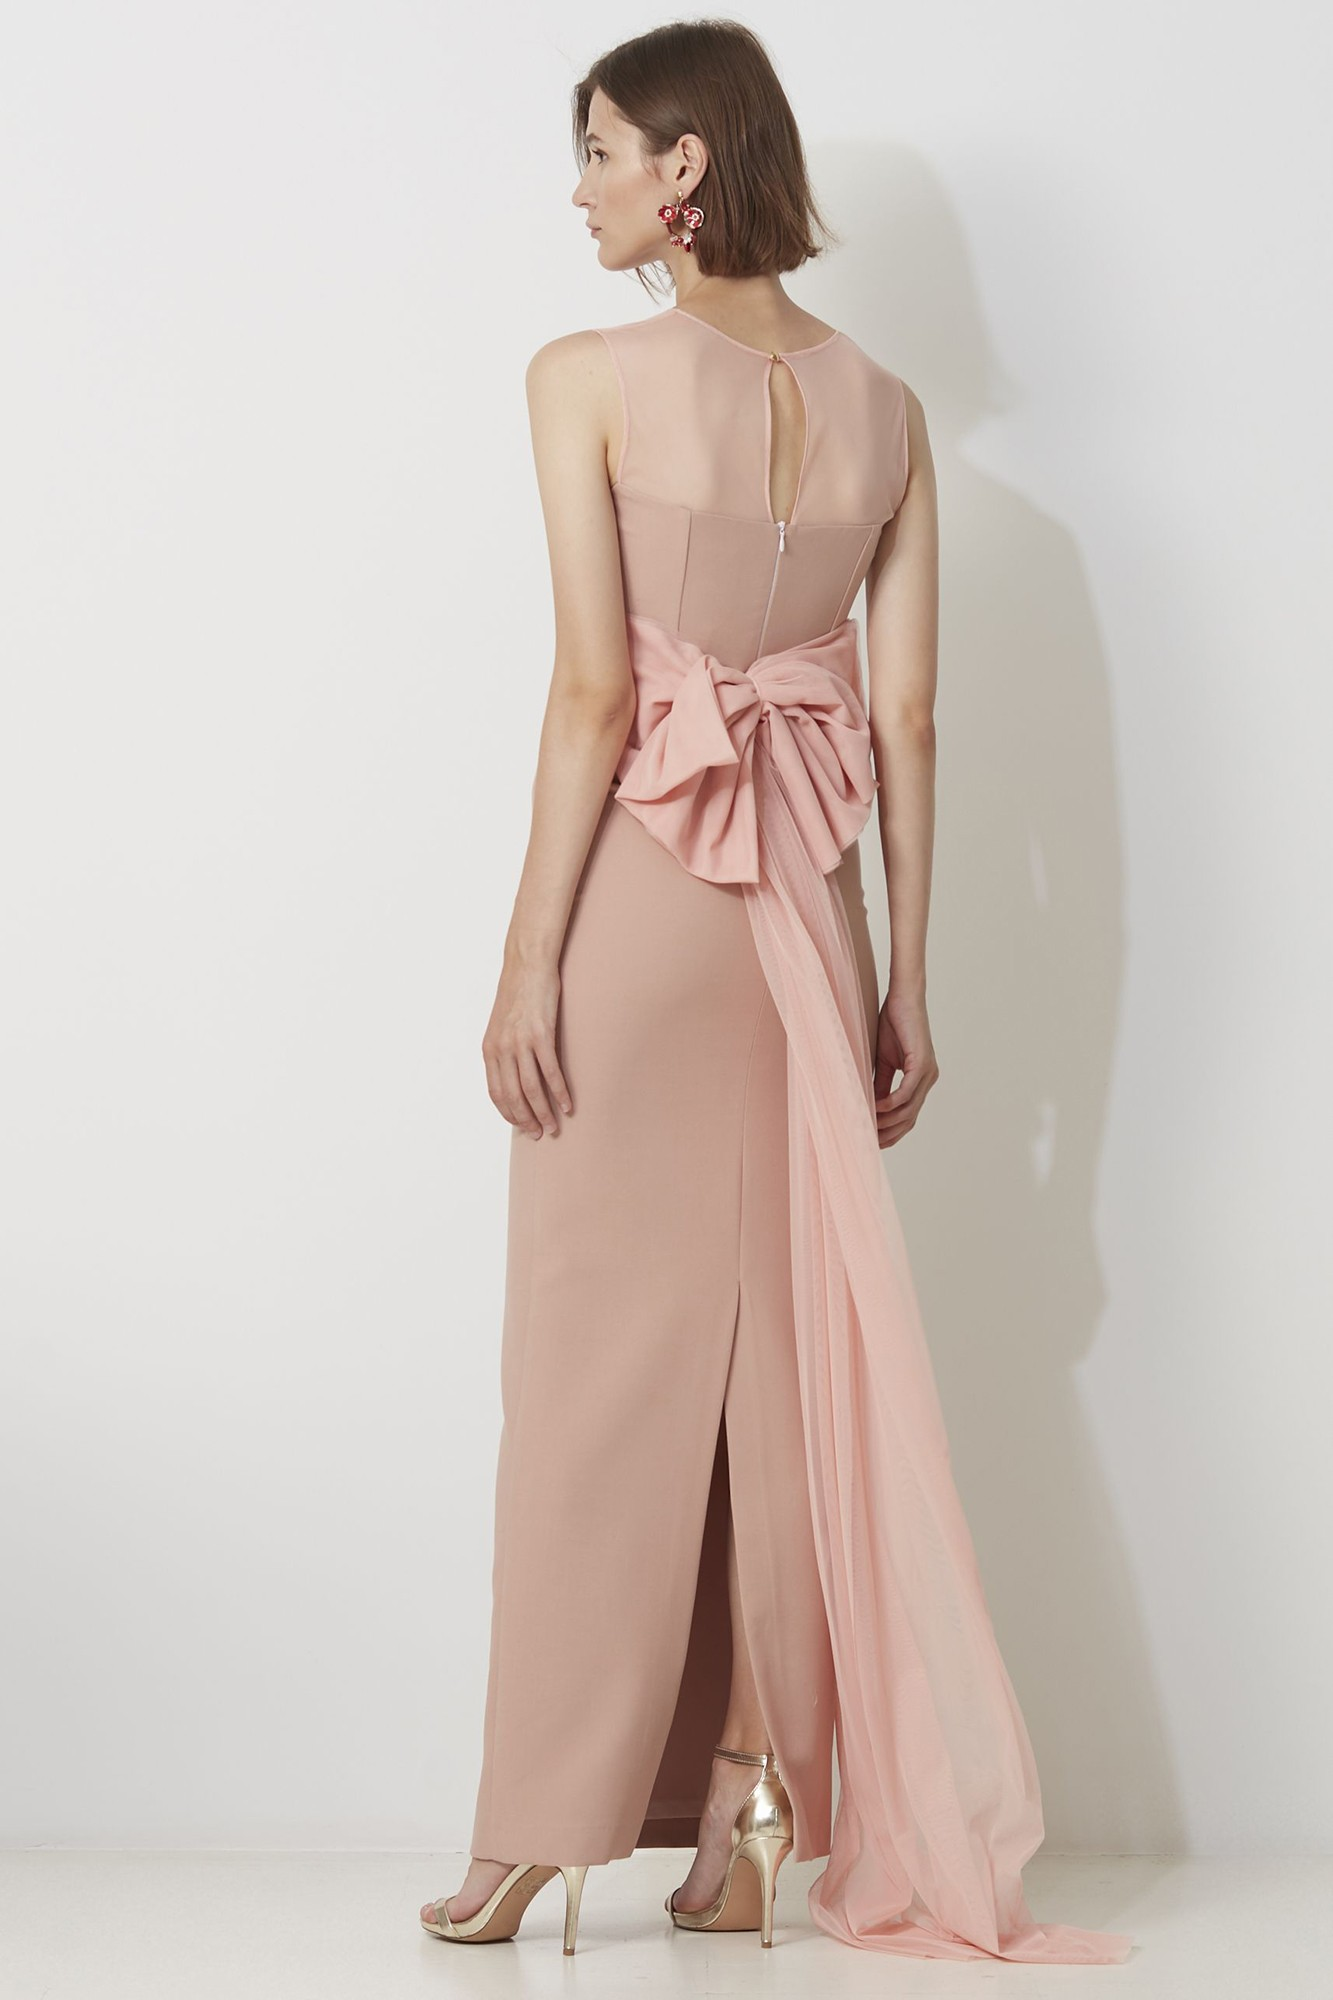 BRICE PINK DRESS